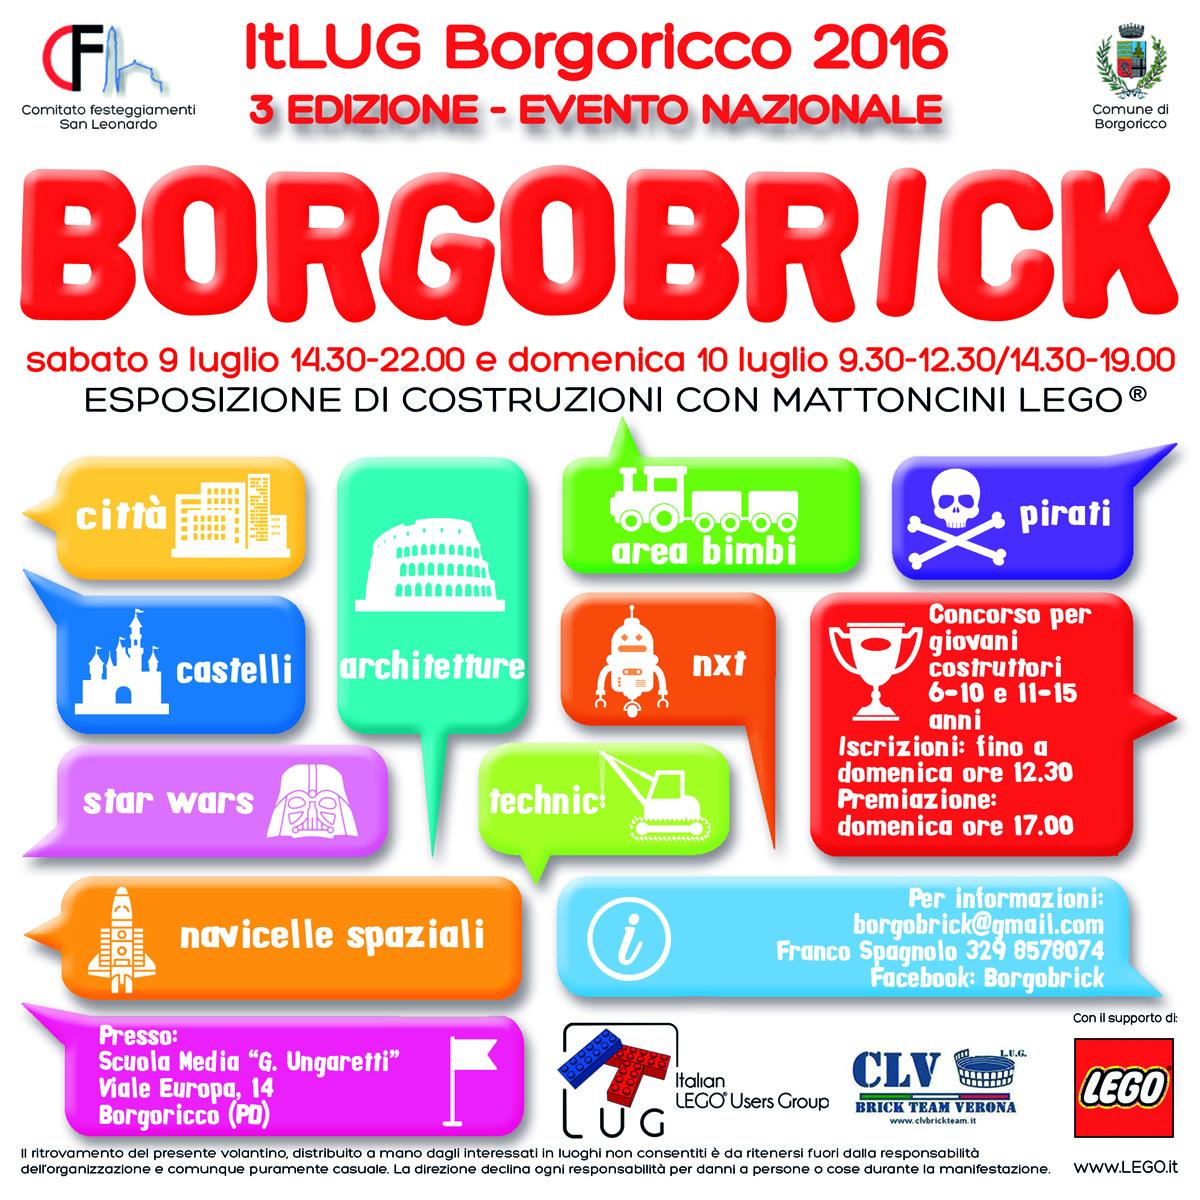 BORGOBRICK 2016